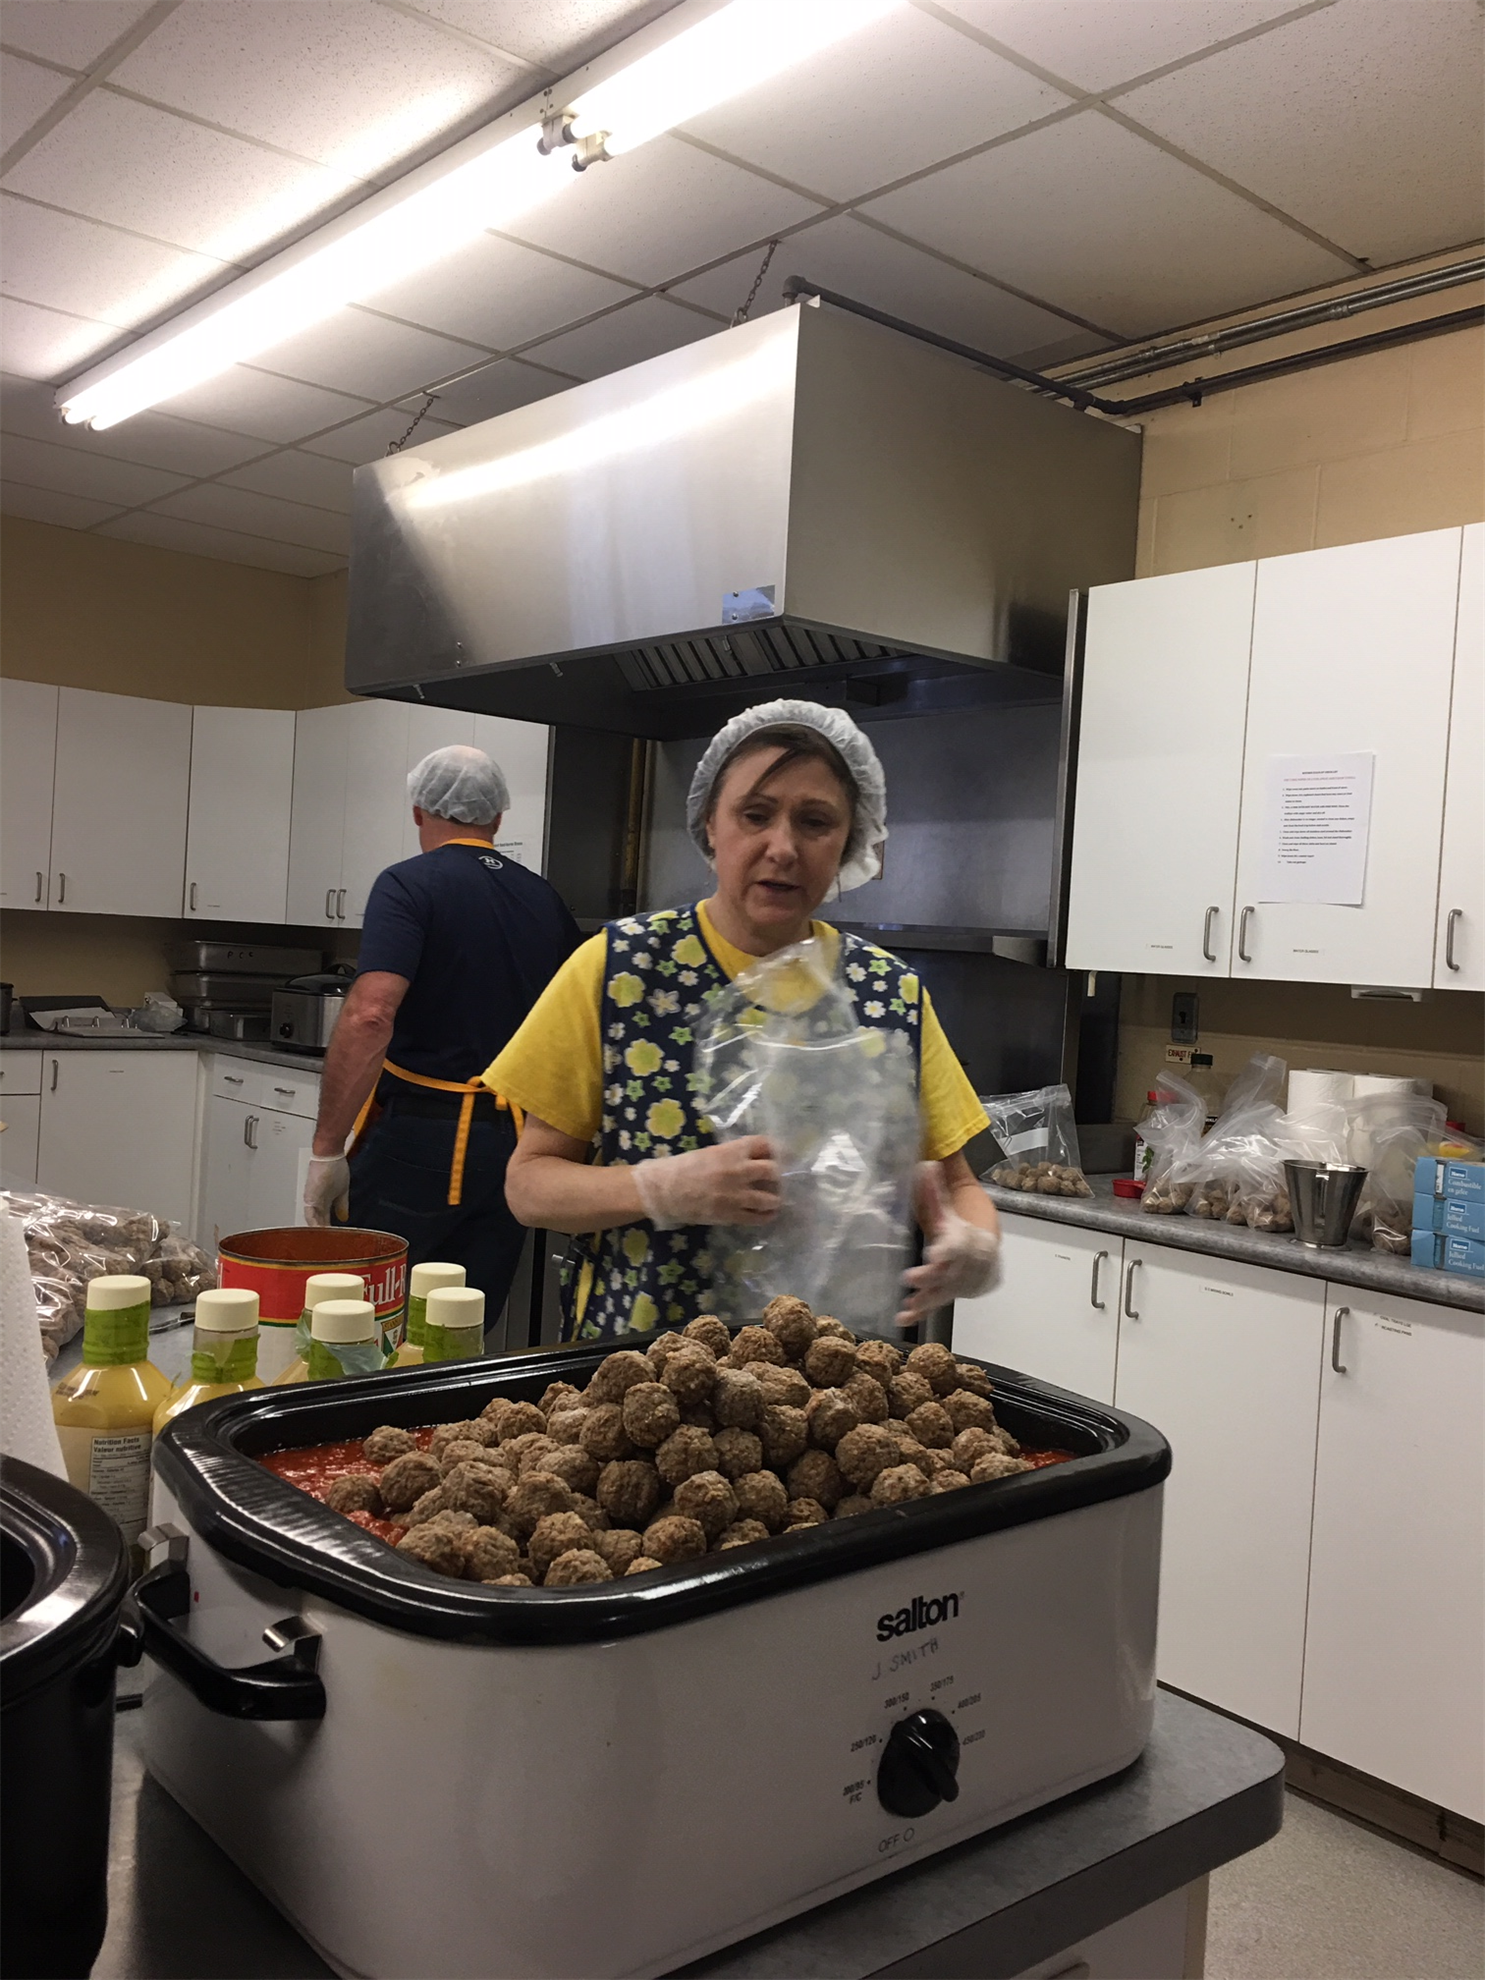 President Linda and those amazing meatballs!